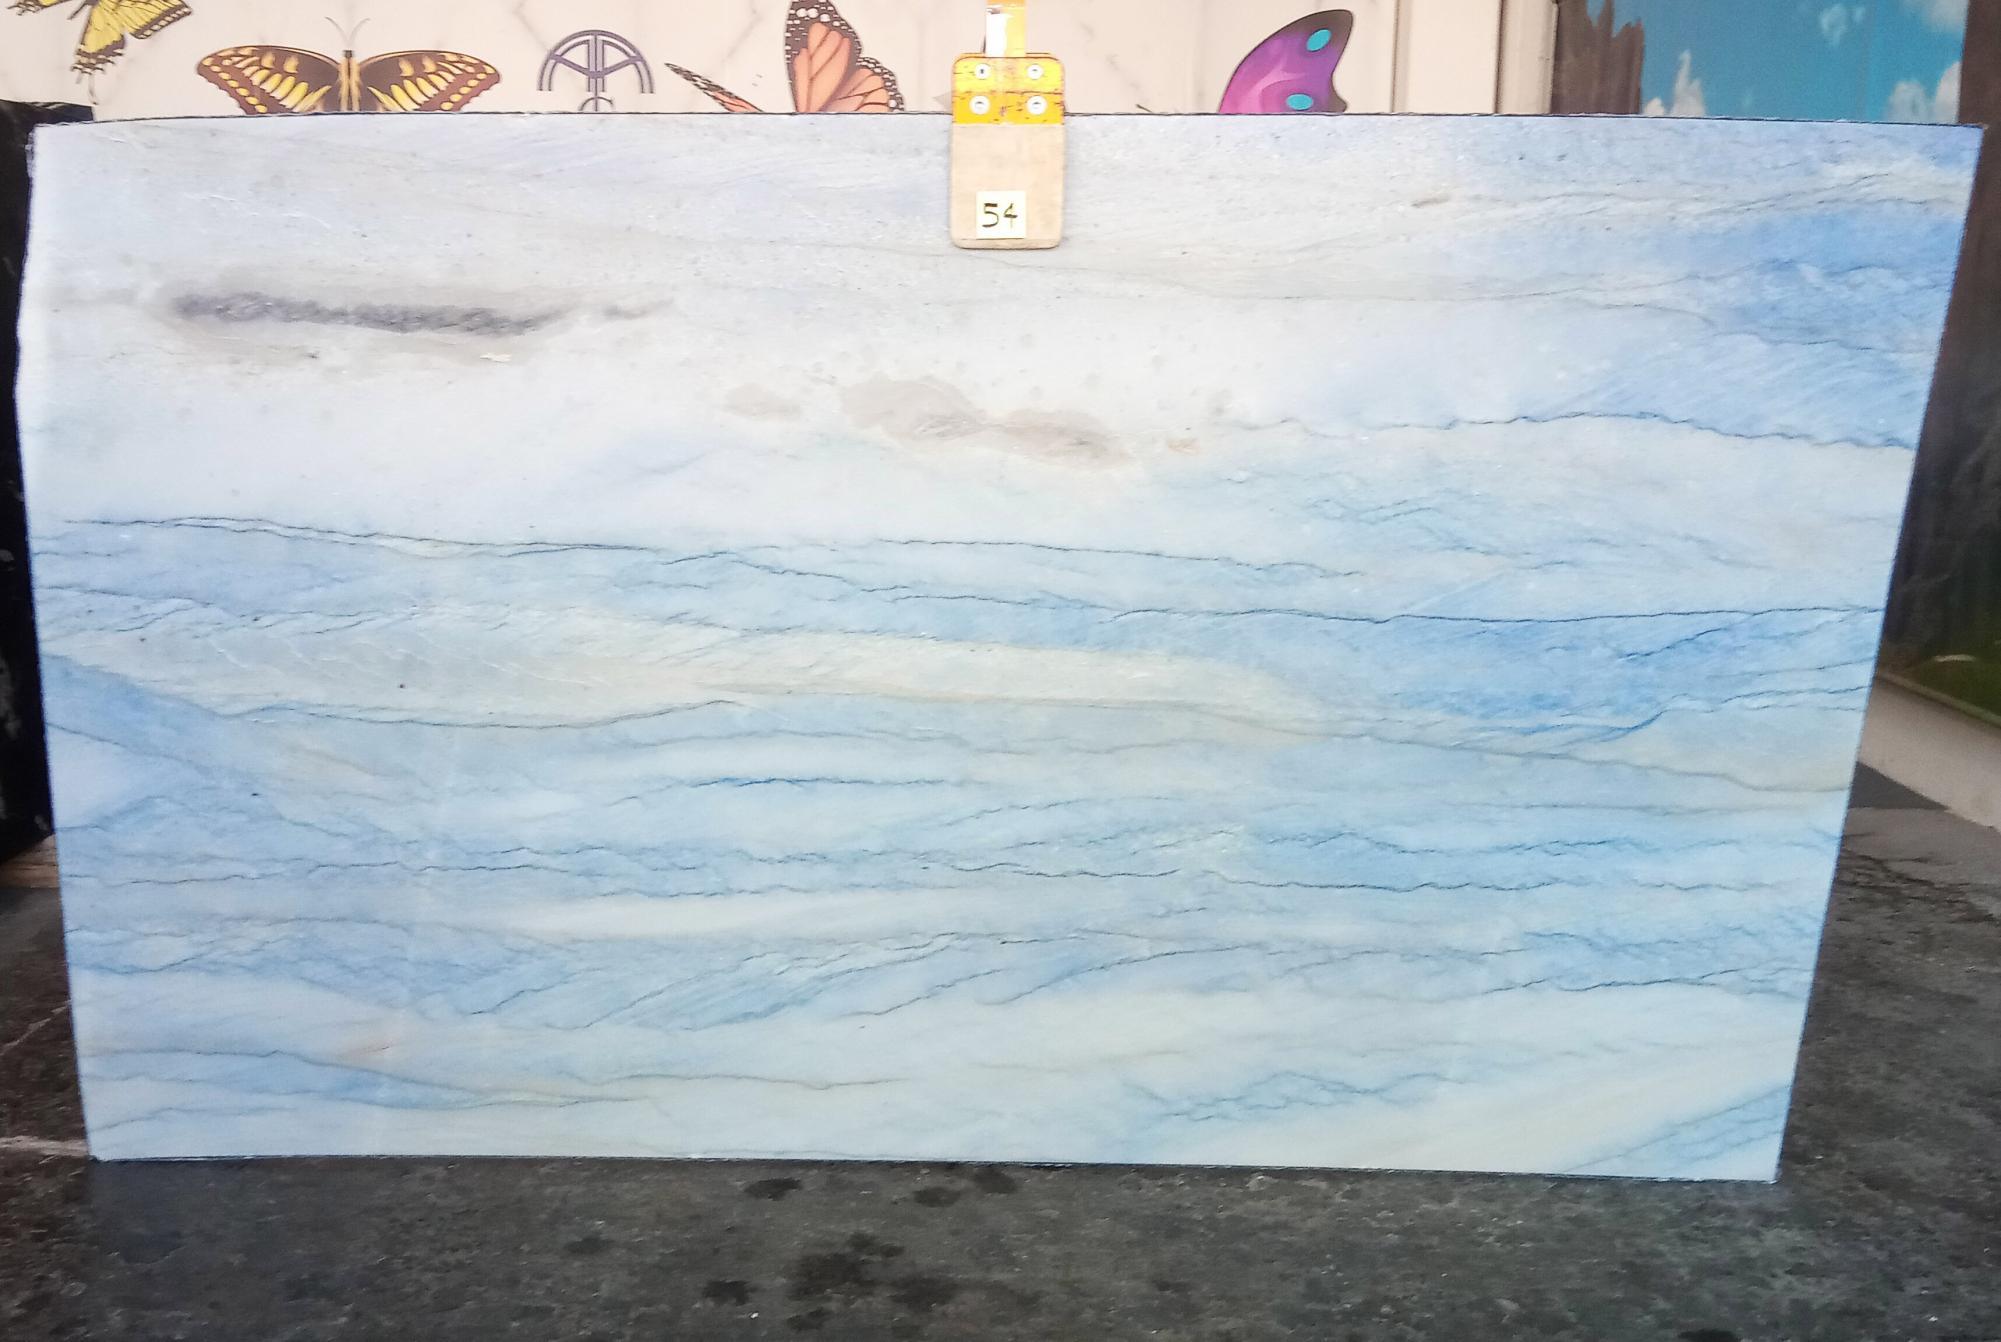 AZUL MAKAUBA polierte Unmaßplatten Z0191 aus Natur Marmor , Slab #54: Lieferung Veneto, Italien